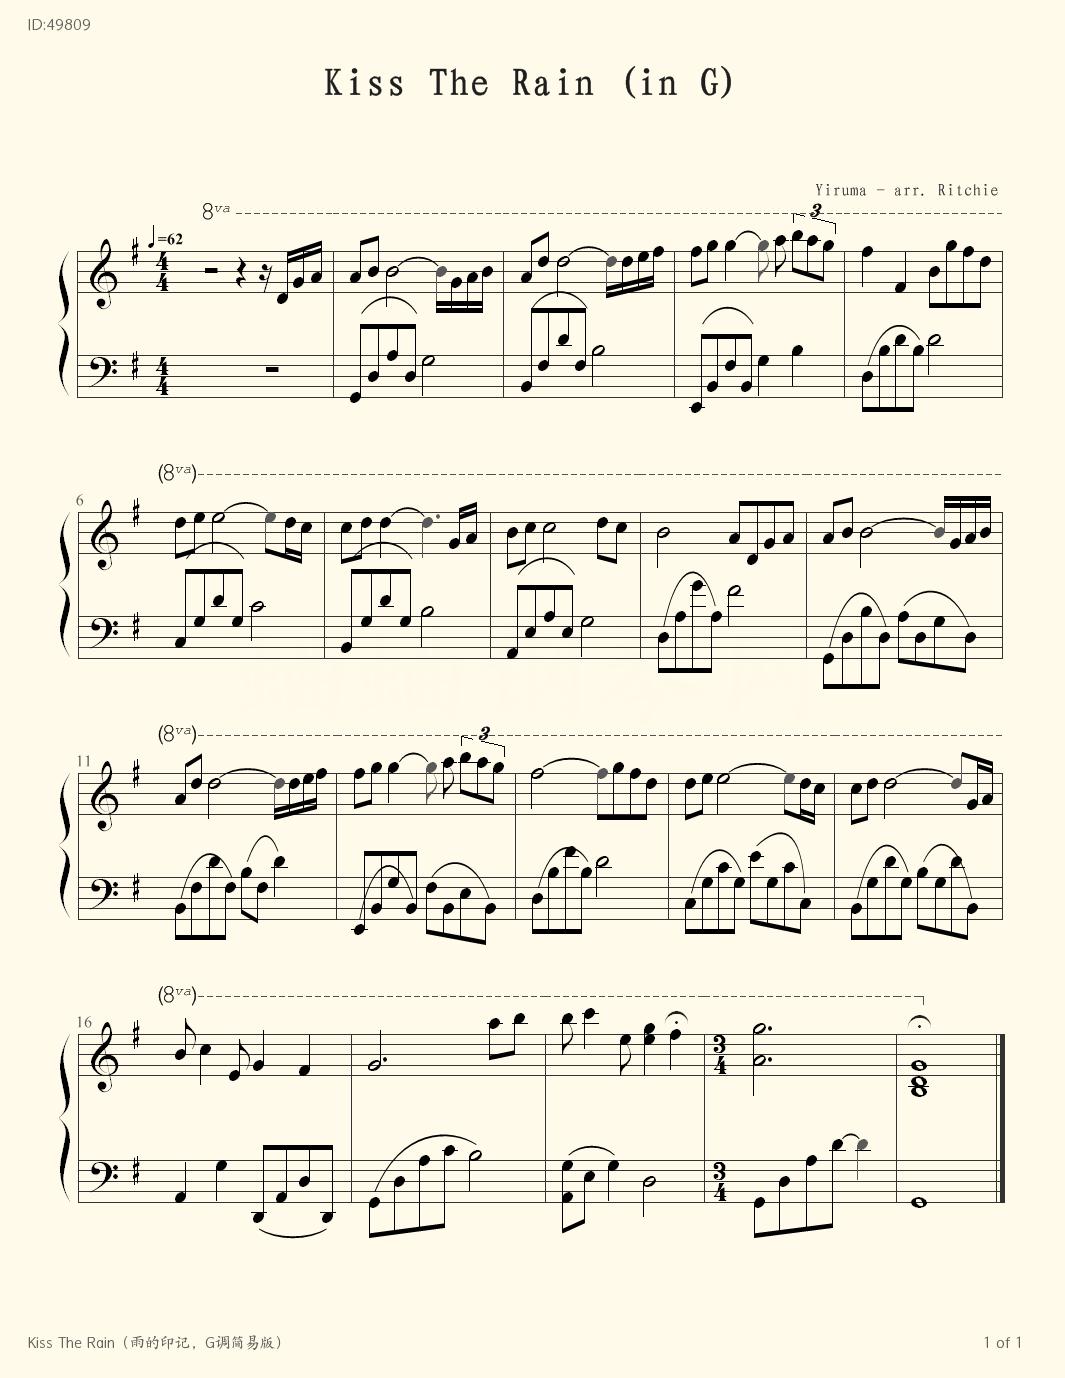 Kiss The Rain G  - yiruma - first page